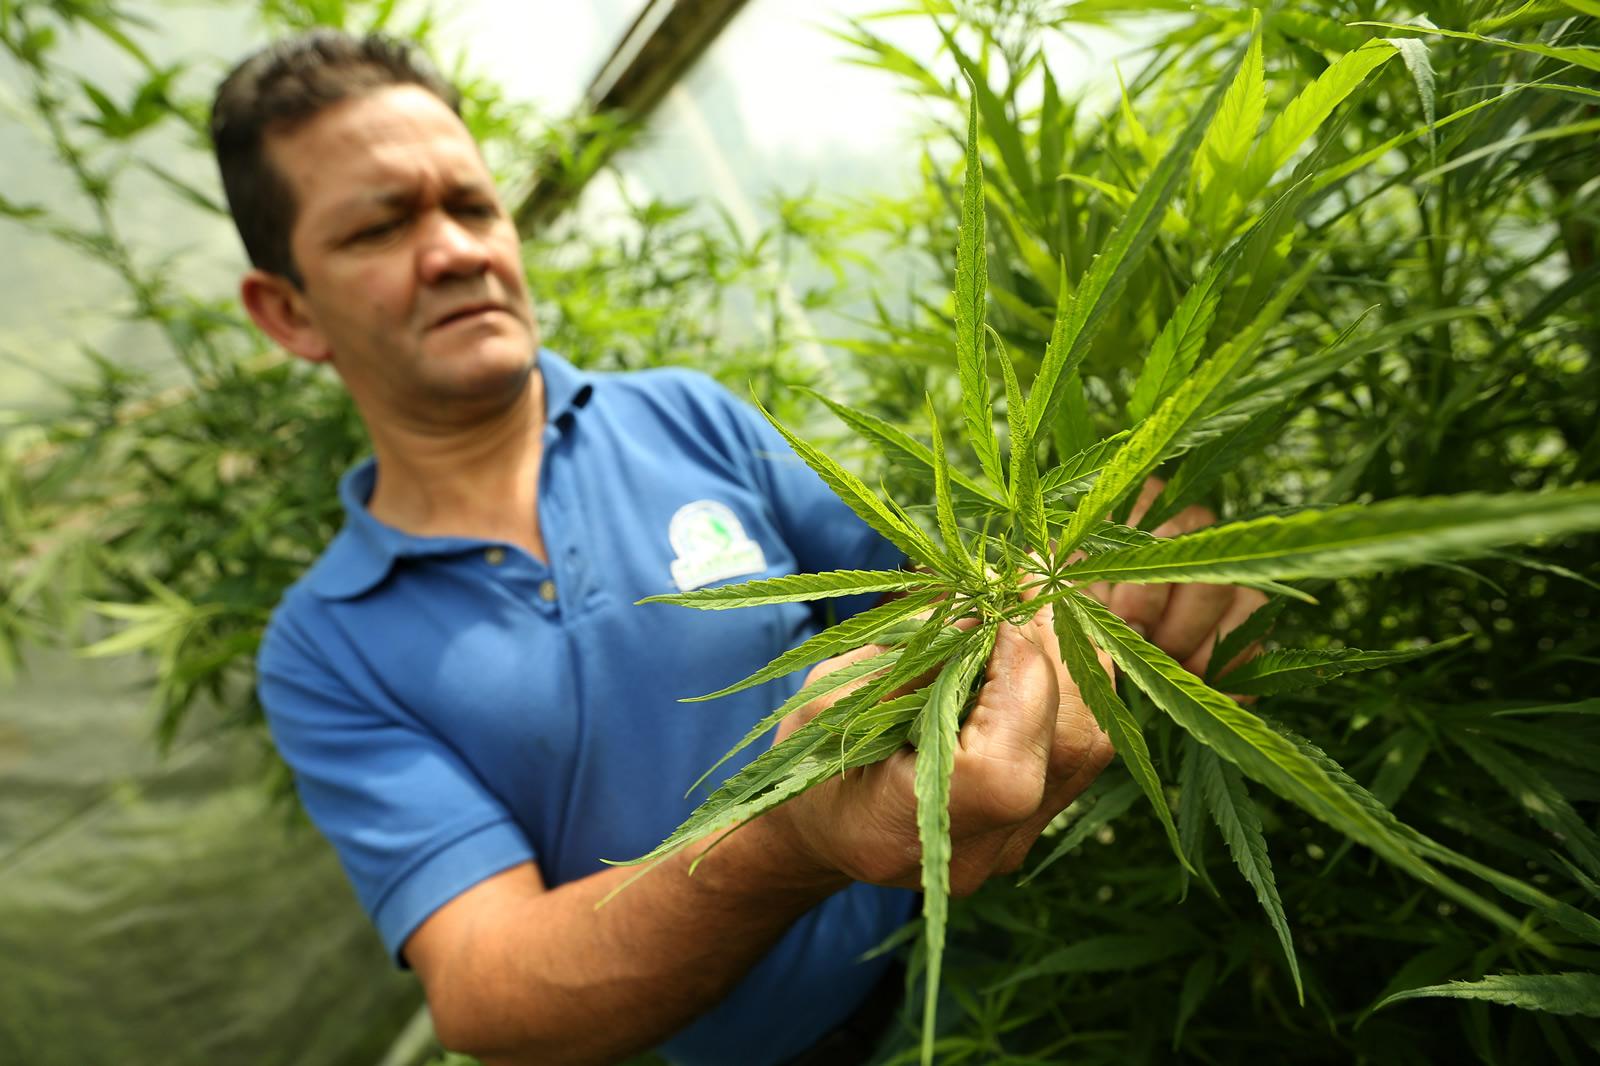 La mata que sana: el boom colombiano del cannabis medicinal